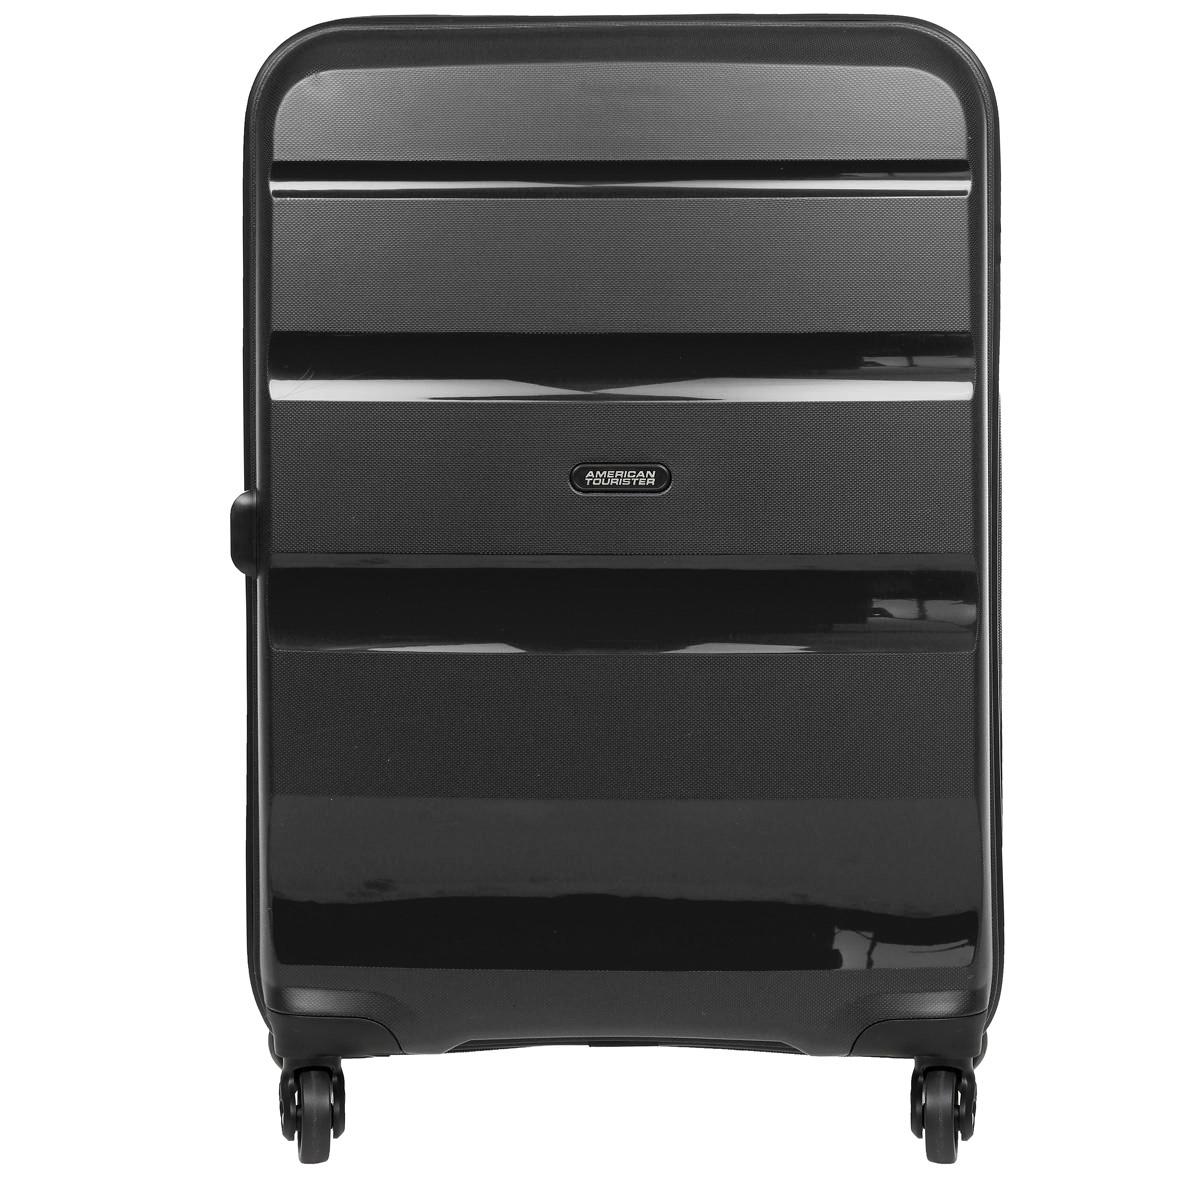 Чемодан American Tourister Bon Air, цвет: черный, 84 л чемодан american tourister pasadena spinner 55 см белый